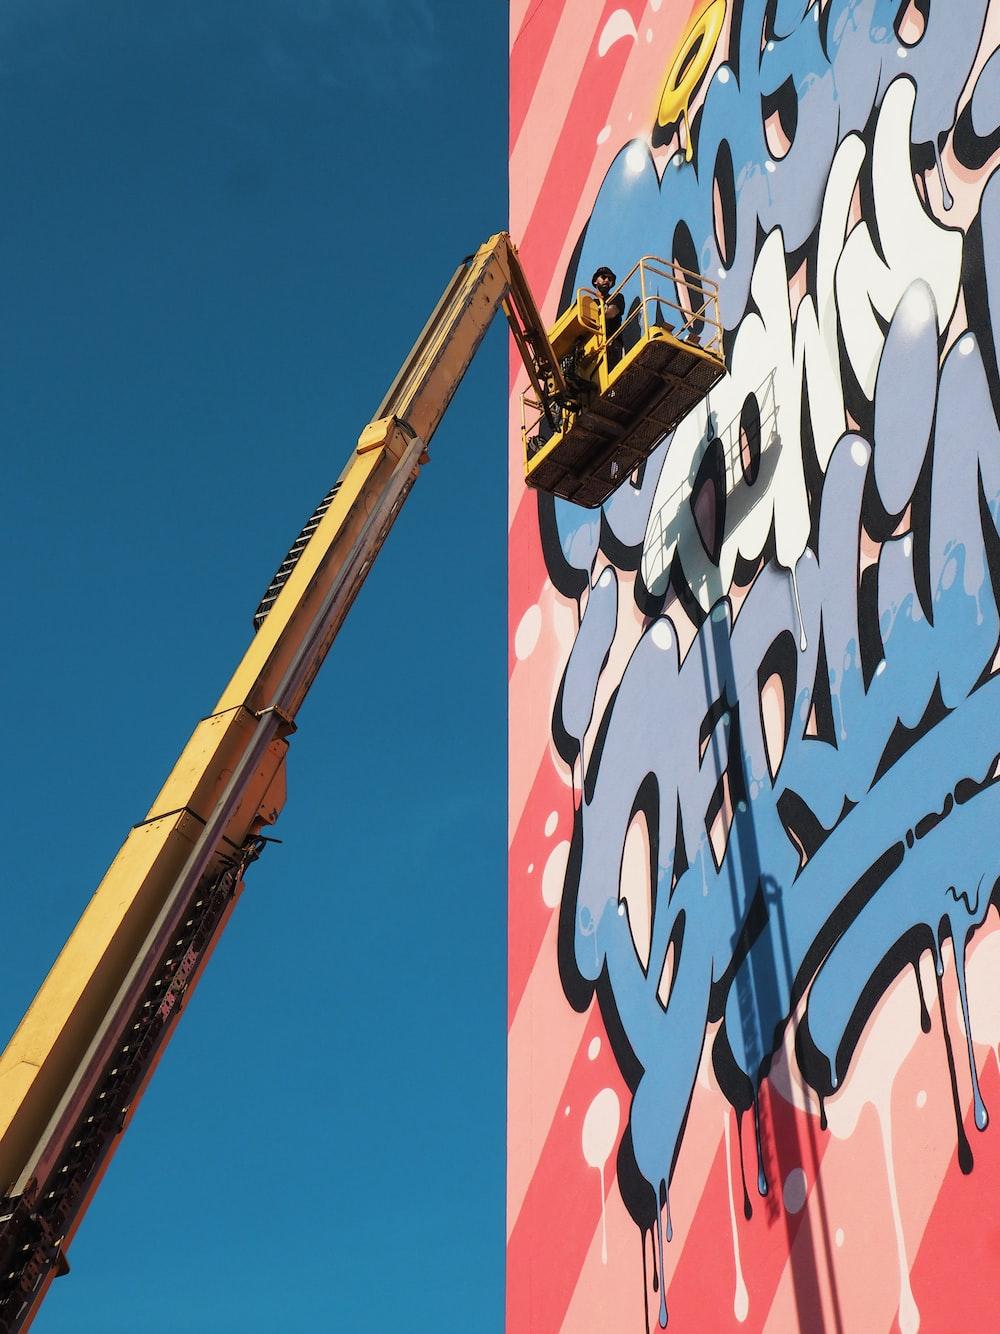 yellow bucket truck near graffiti wall art during daytime